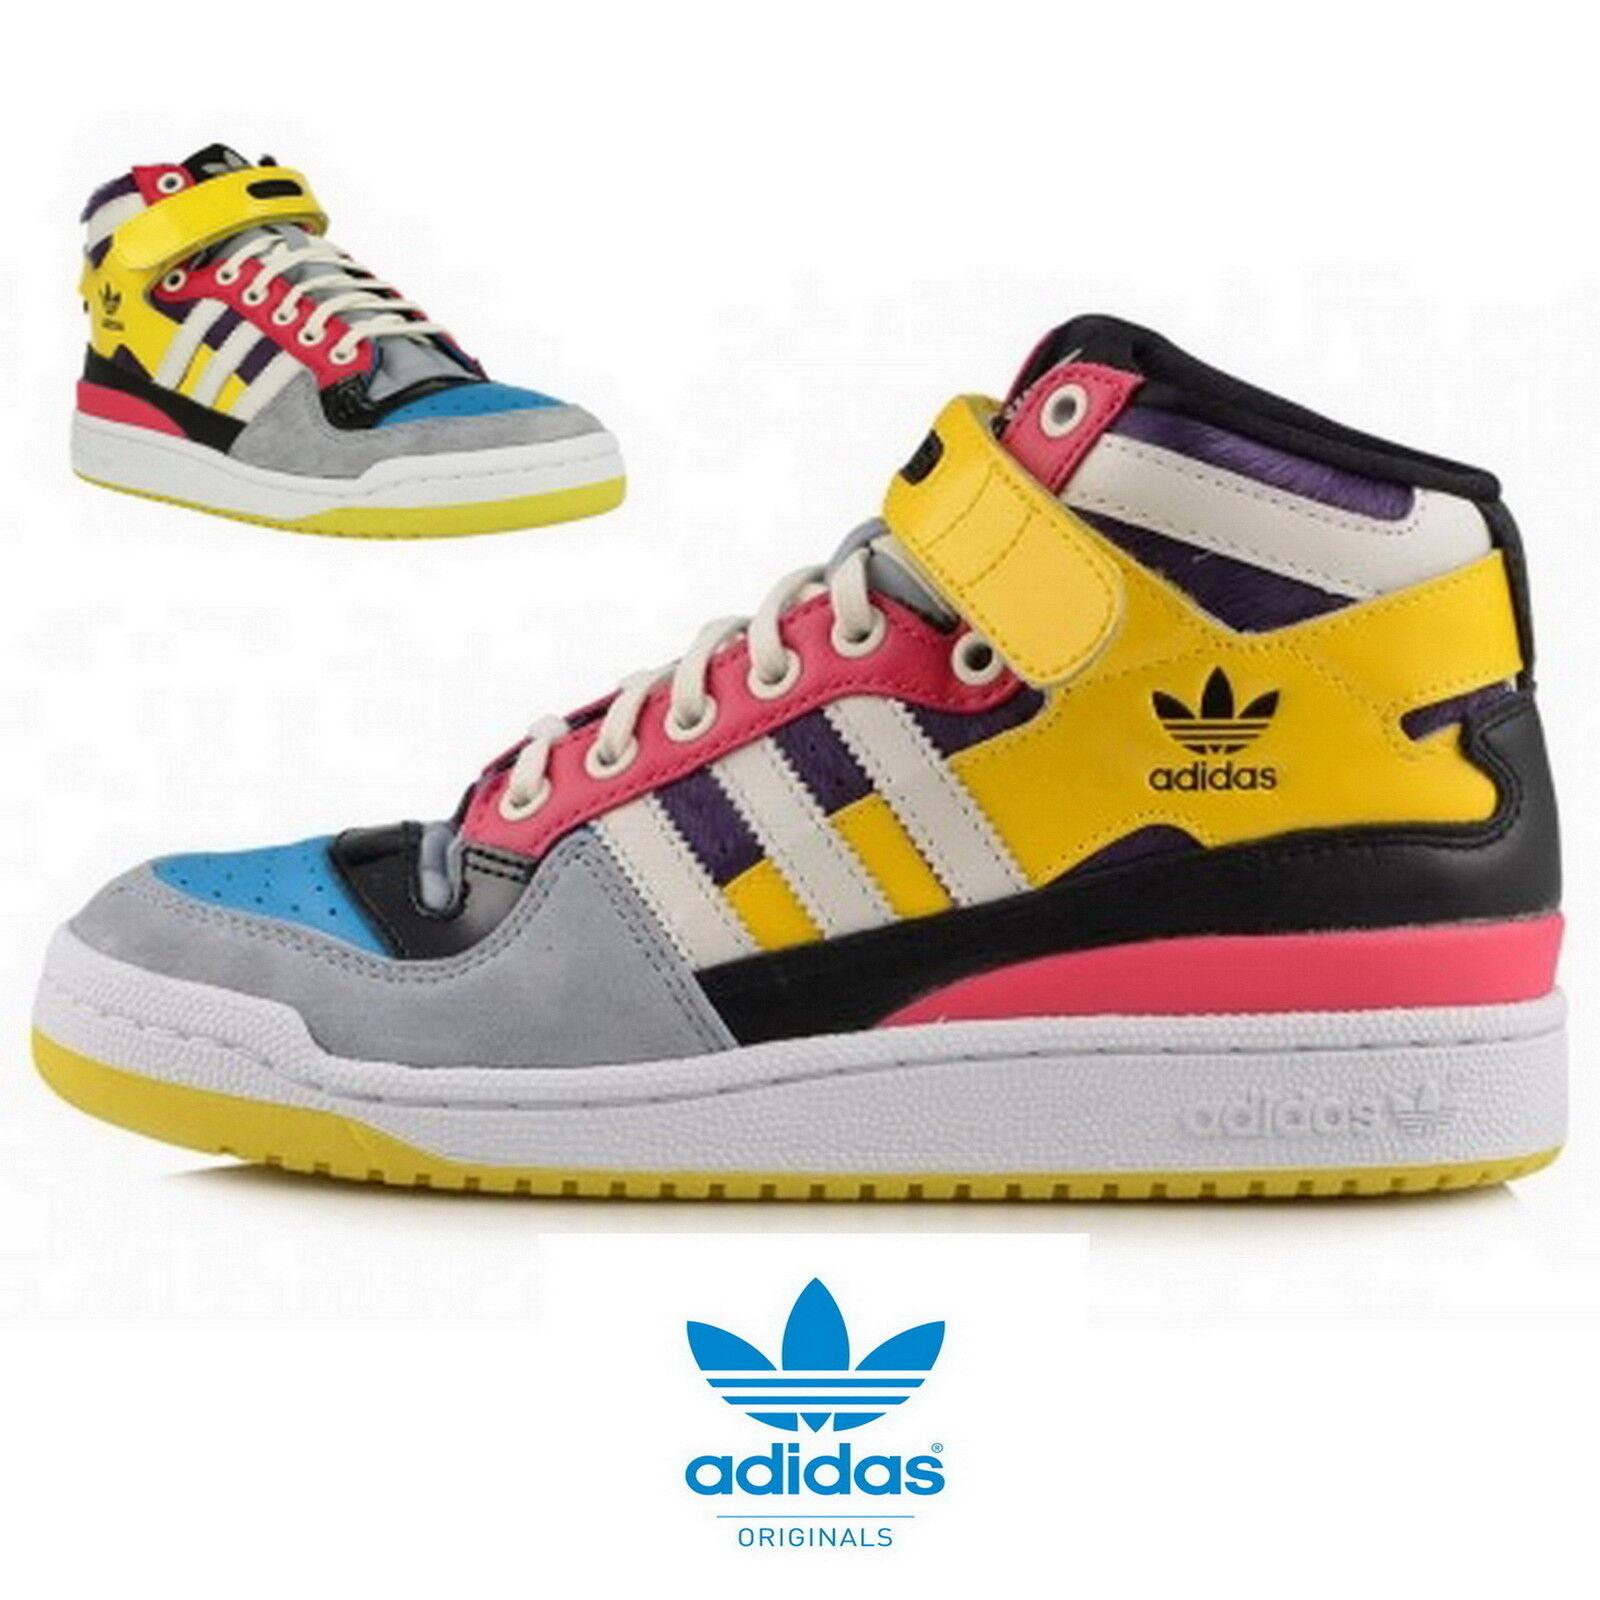 Adidas FORUM MID W Damen Turnschuhe MultiFarbe M25100